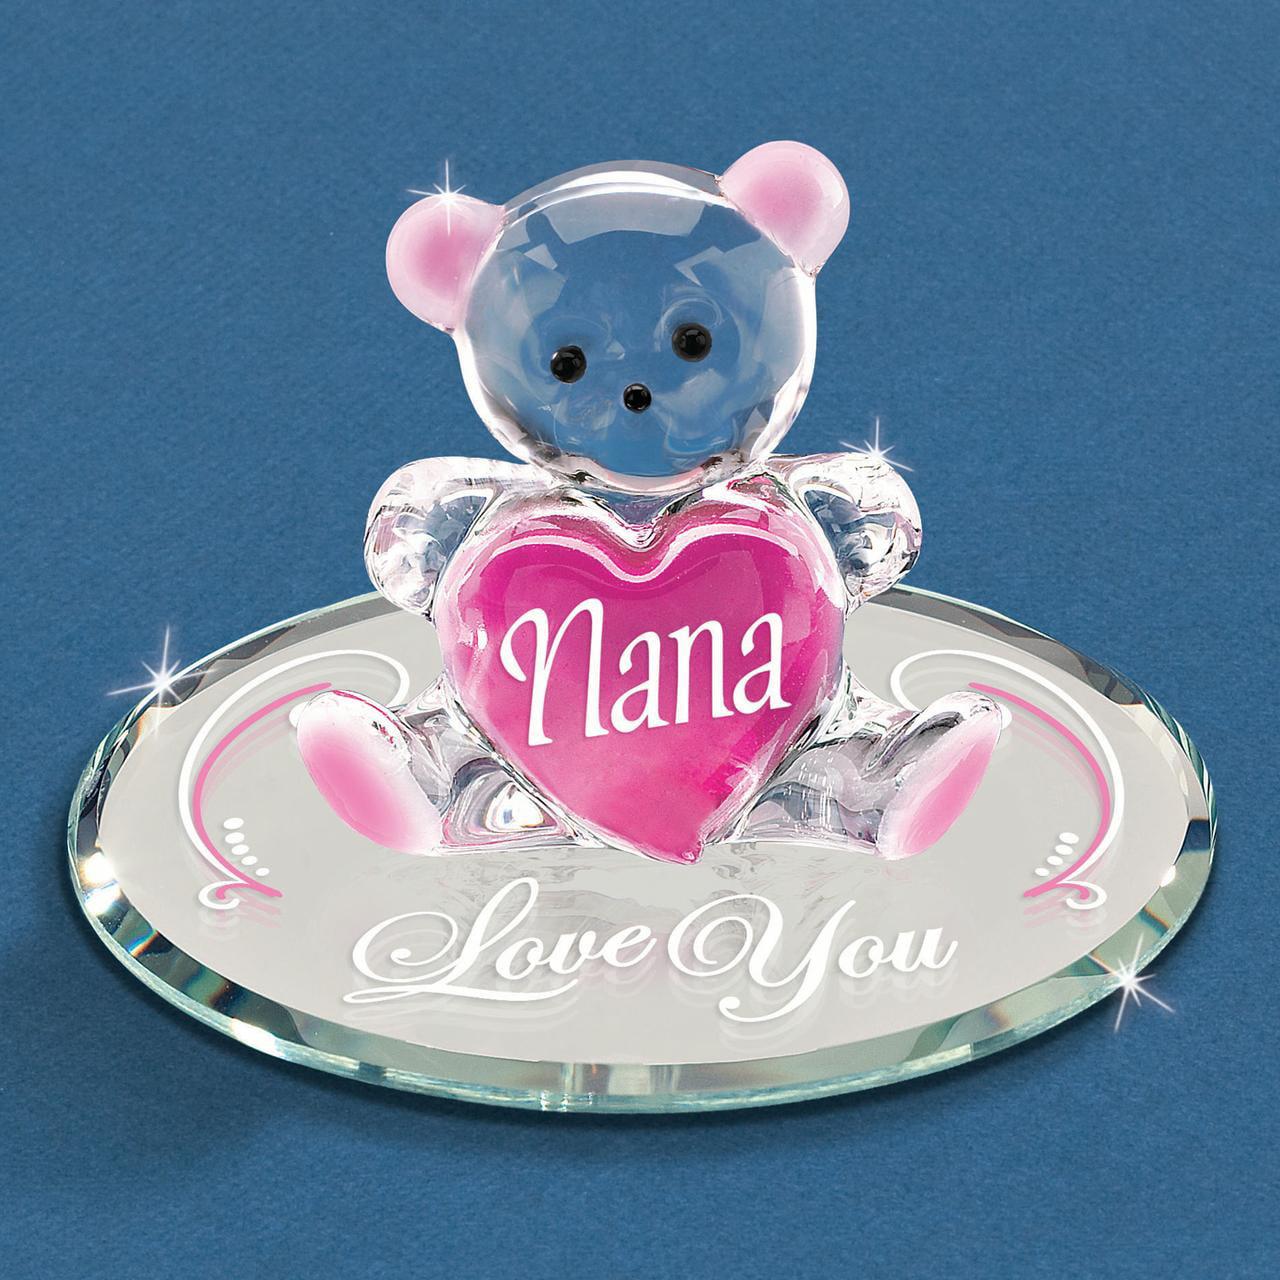 Nana Love You Bear Glass Figurine Religious Baptism/christening/communion Grparent Great For Women